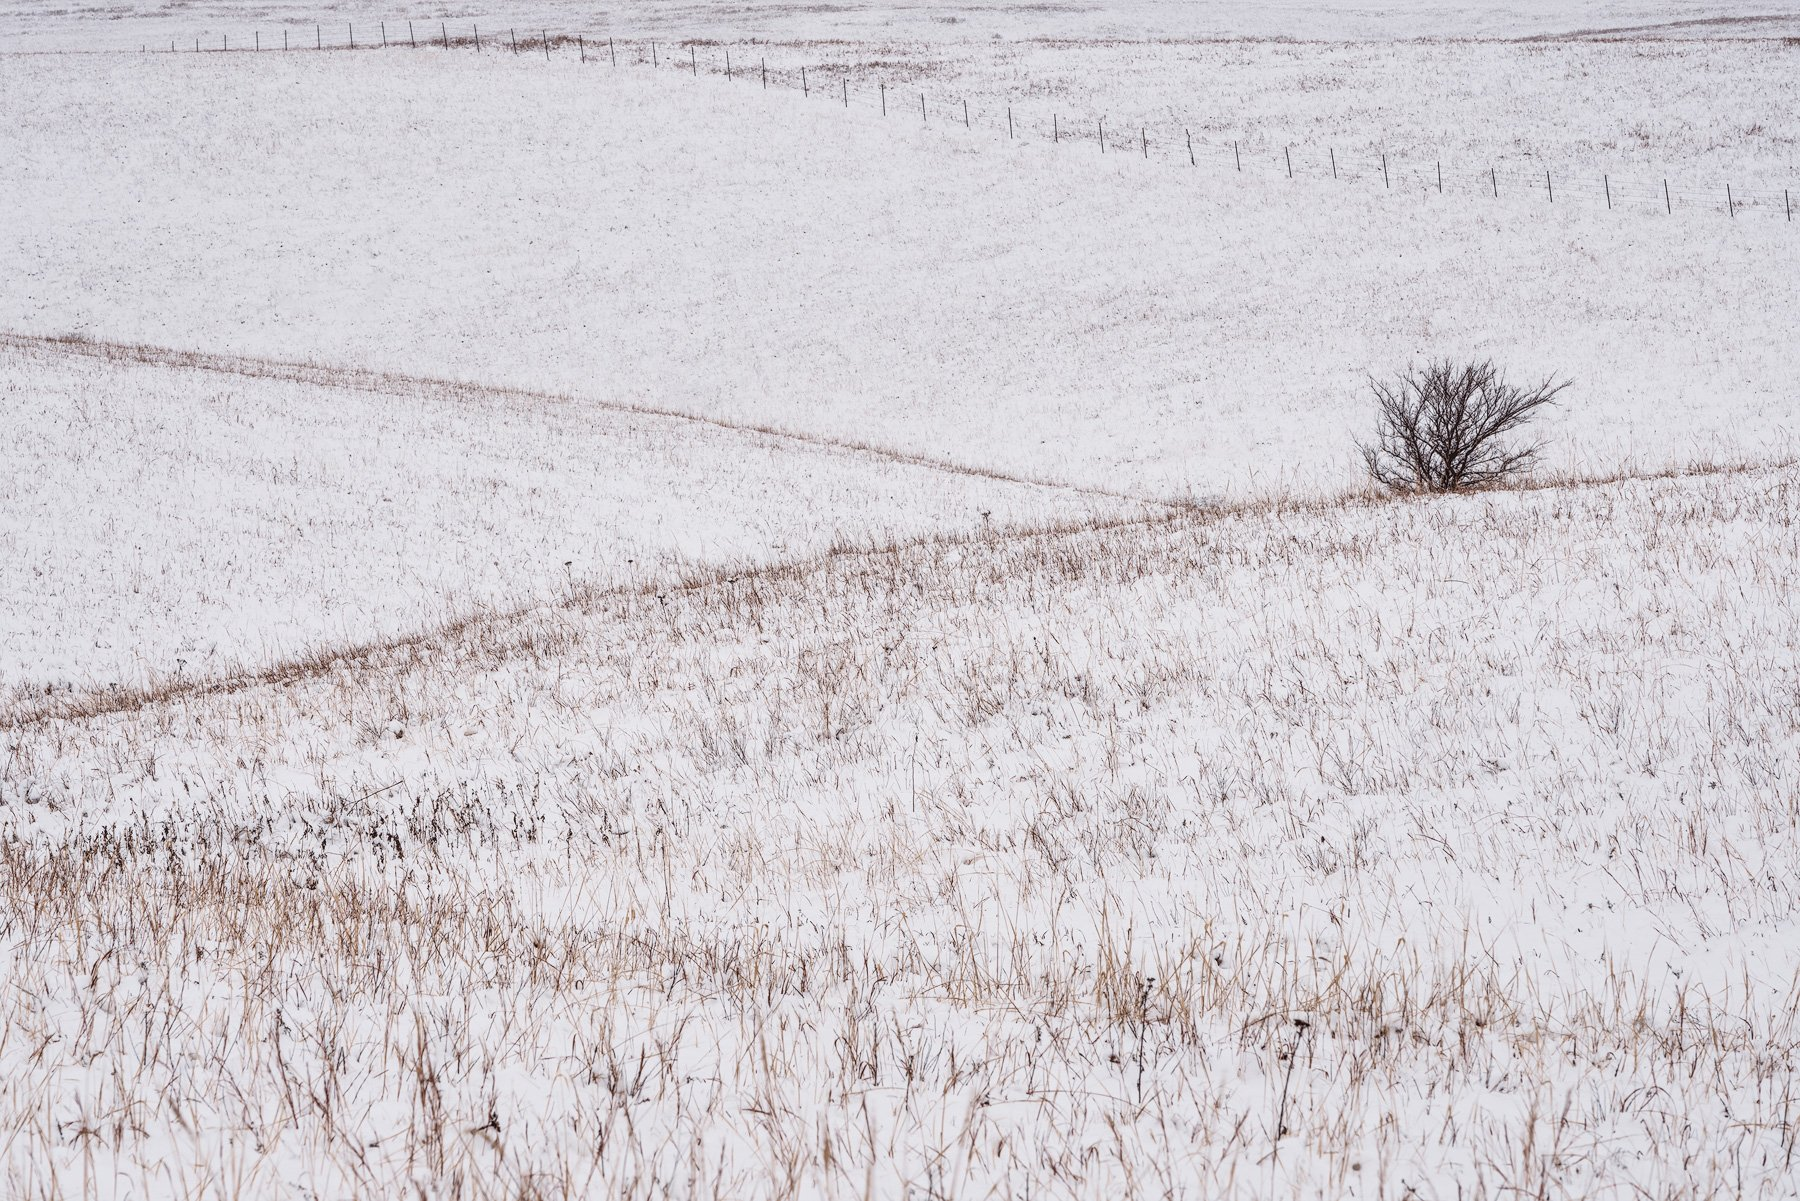 Winter view in the tallgrass prairie, Kansas